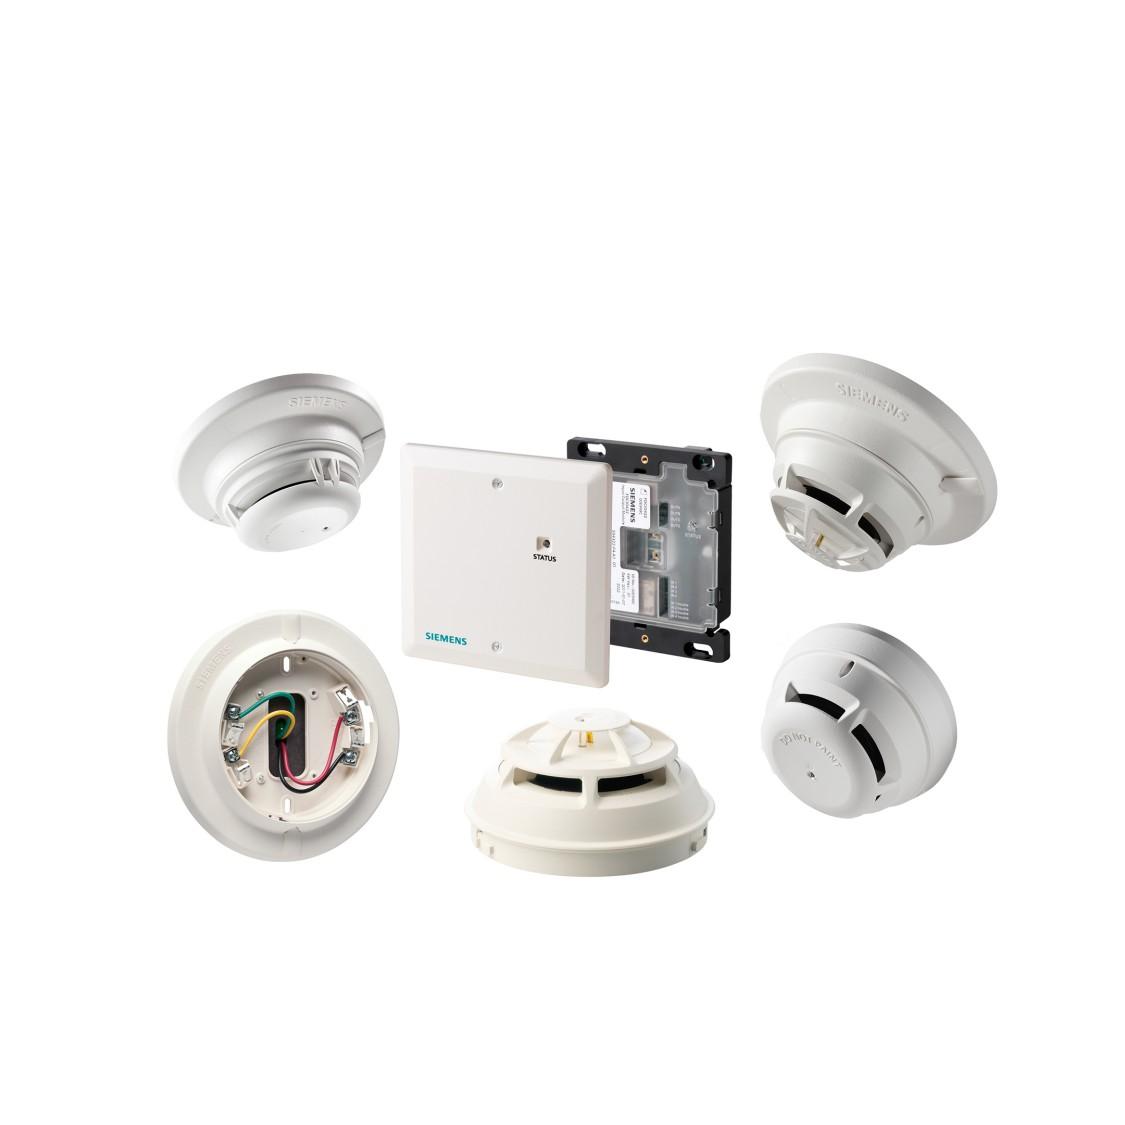 Siemens fire detection